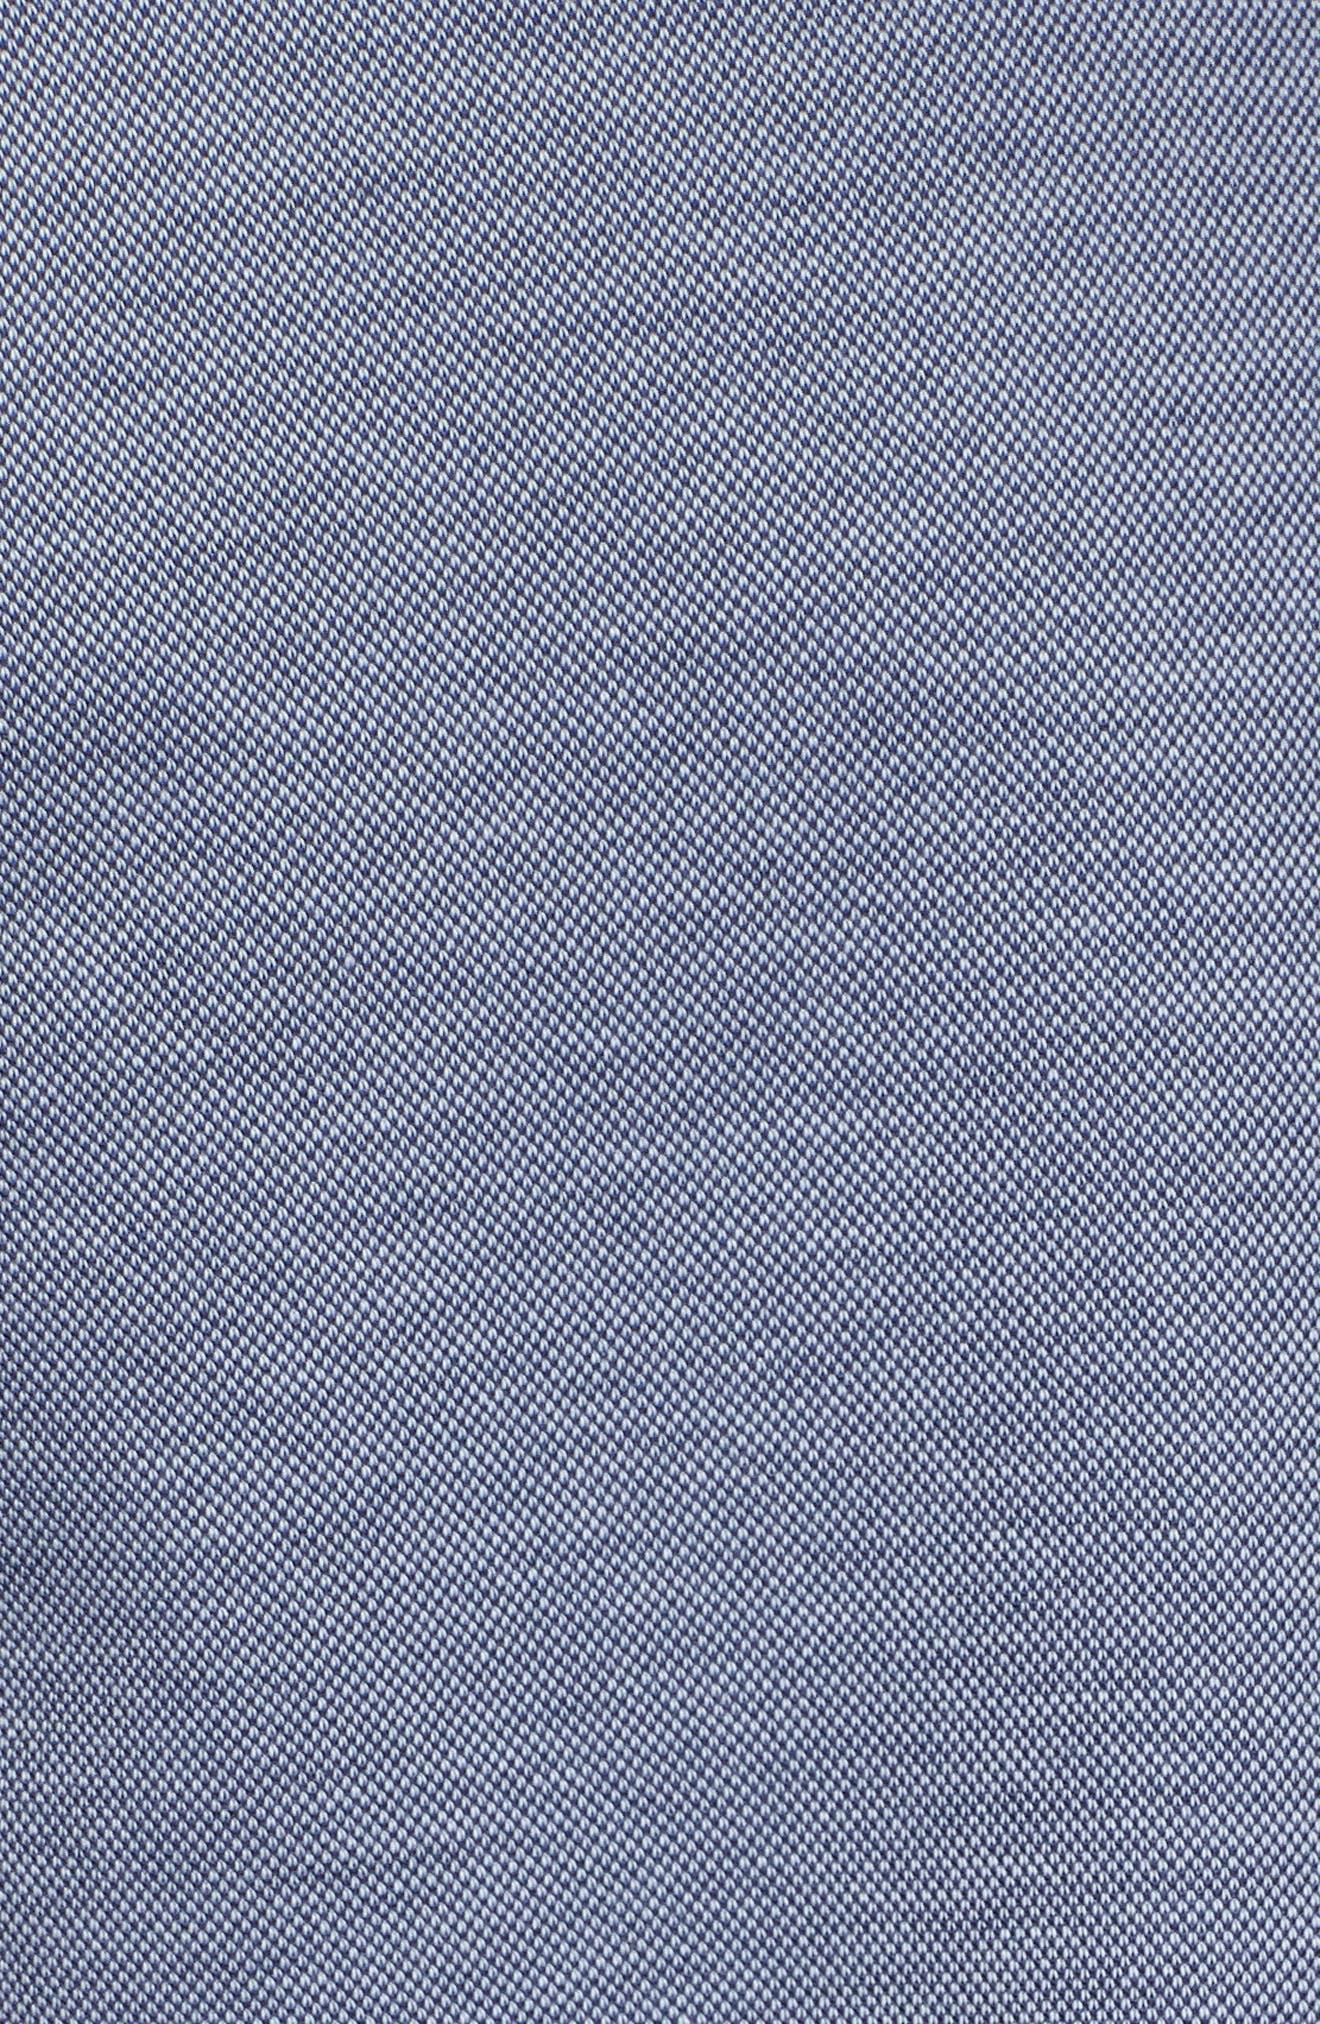 Andrew Regular Fit Piqué Polo,                             Alternate thumbnail 5, color,                             PURA VIDA BLUE